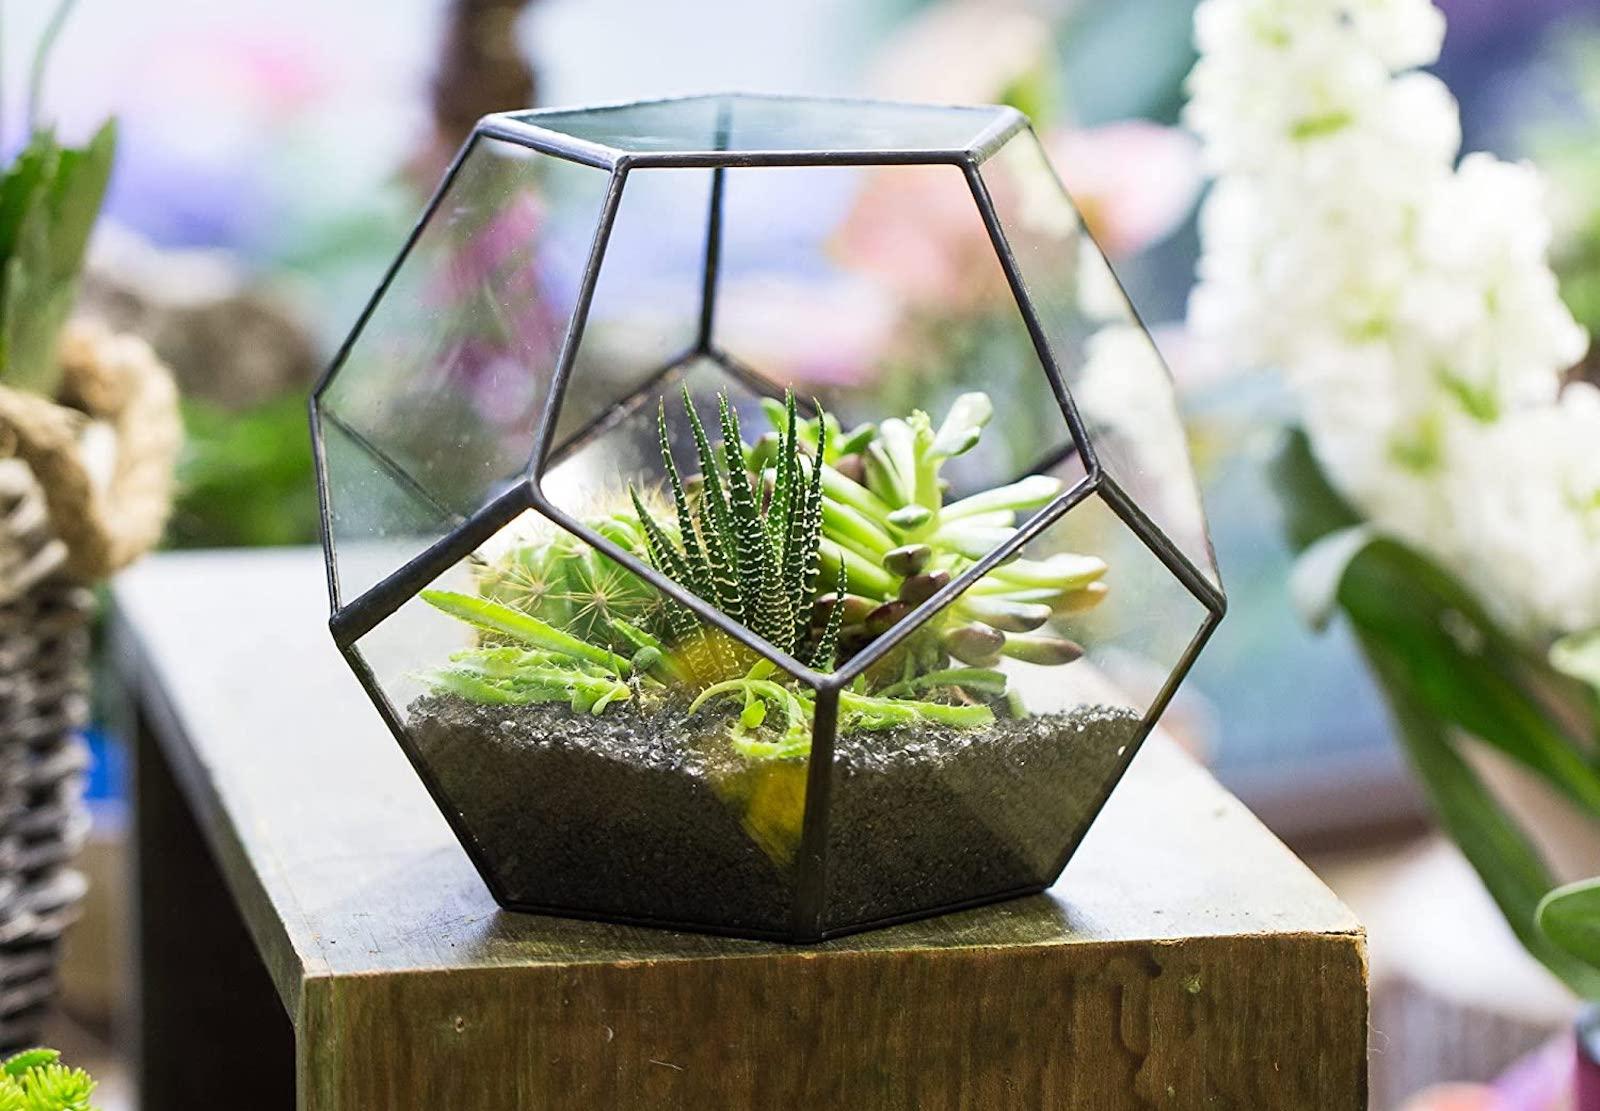 A glass geometric terrarium with plants inside, sitting on a wood block